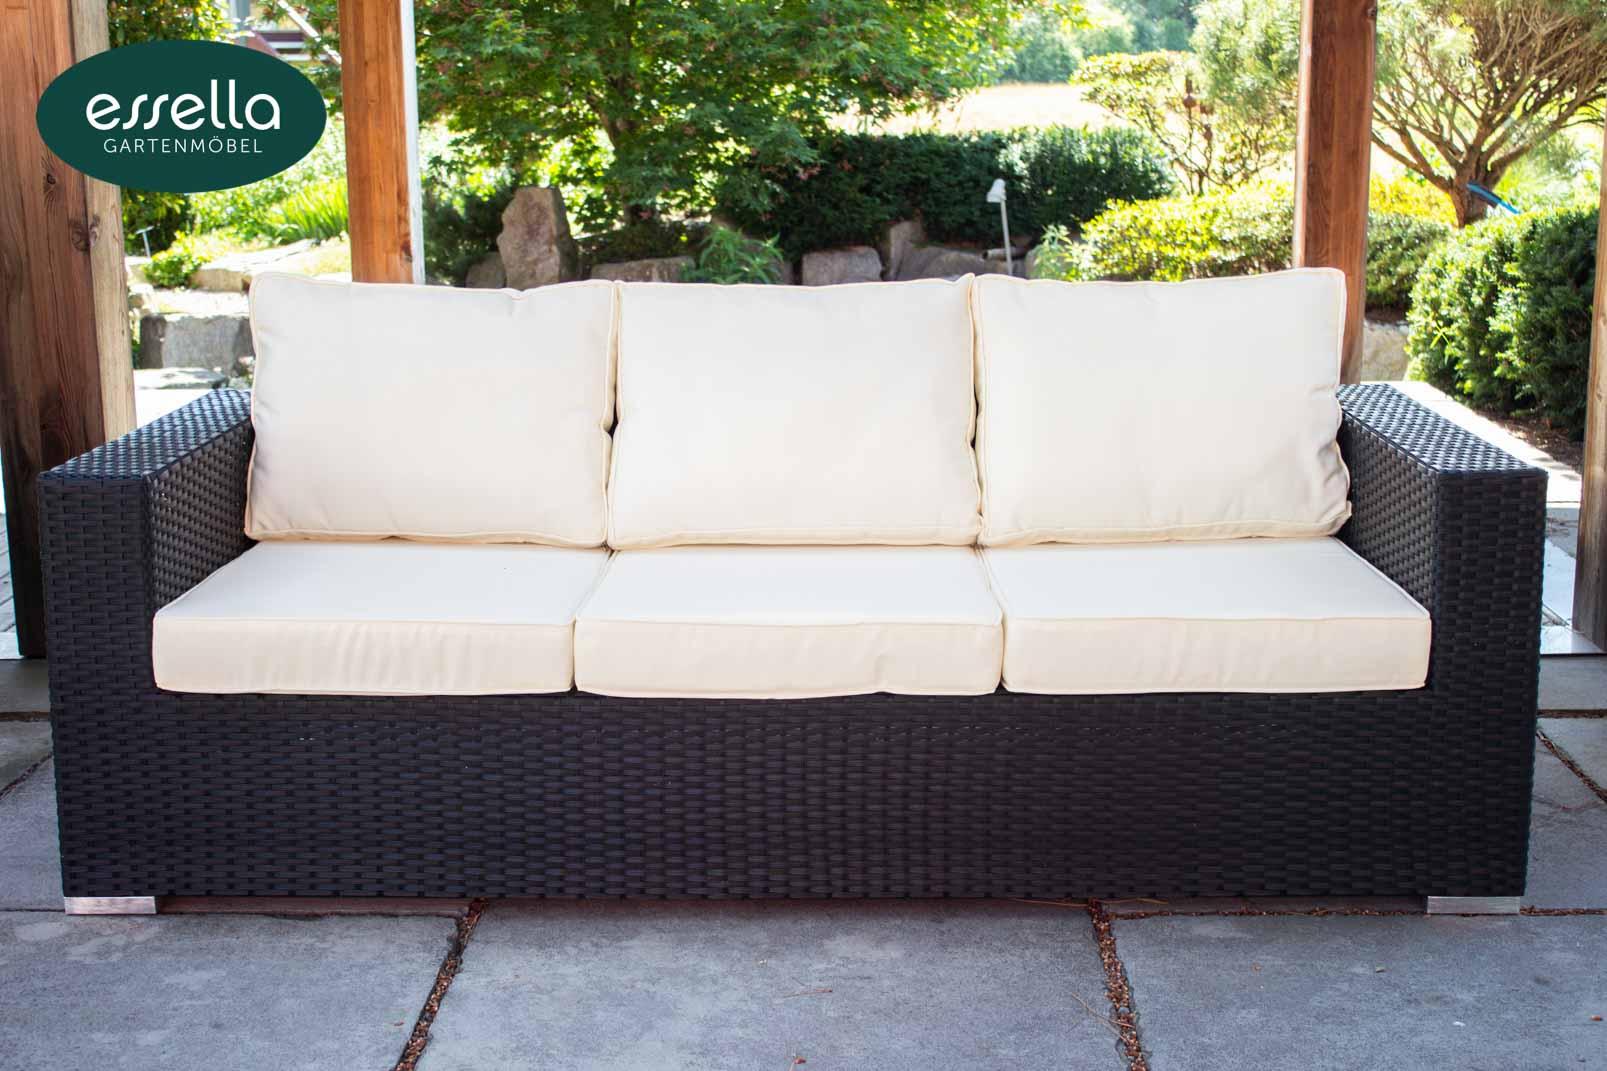 Full Size of Polyrattan Sofa Gartensofa Tchibo Garden Set Outdoor 2 Sitzer Balkon Couch Ausziehbar 2 Sitzer Lounge Essella Bahamas Flachgeflecht Too Design Kunstleder Sofa Polyrattan Sofa